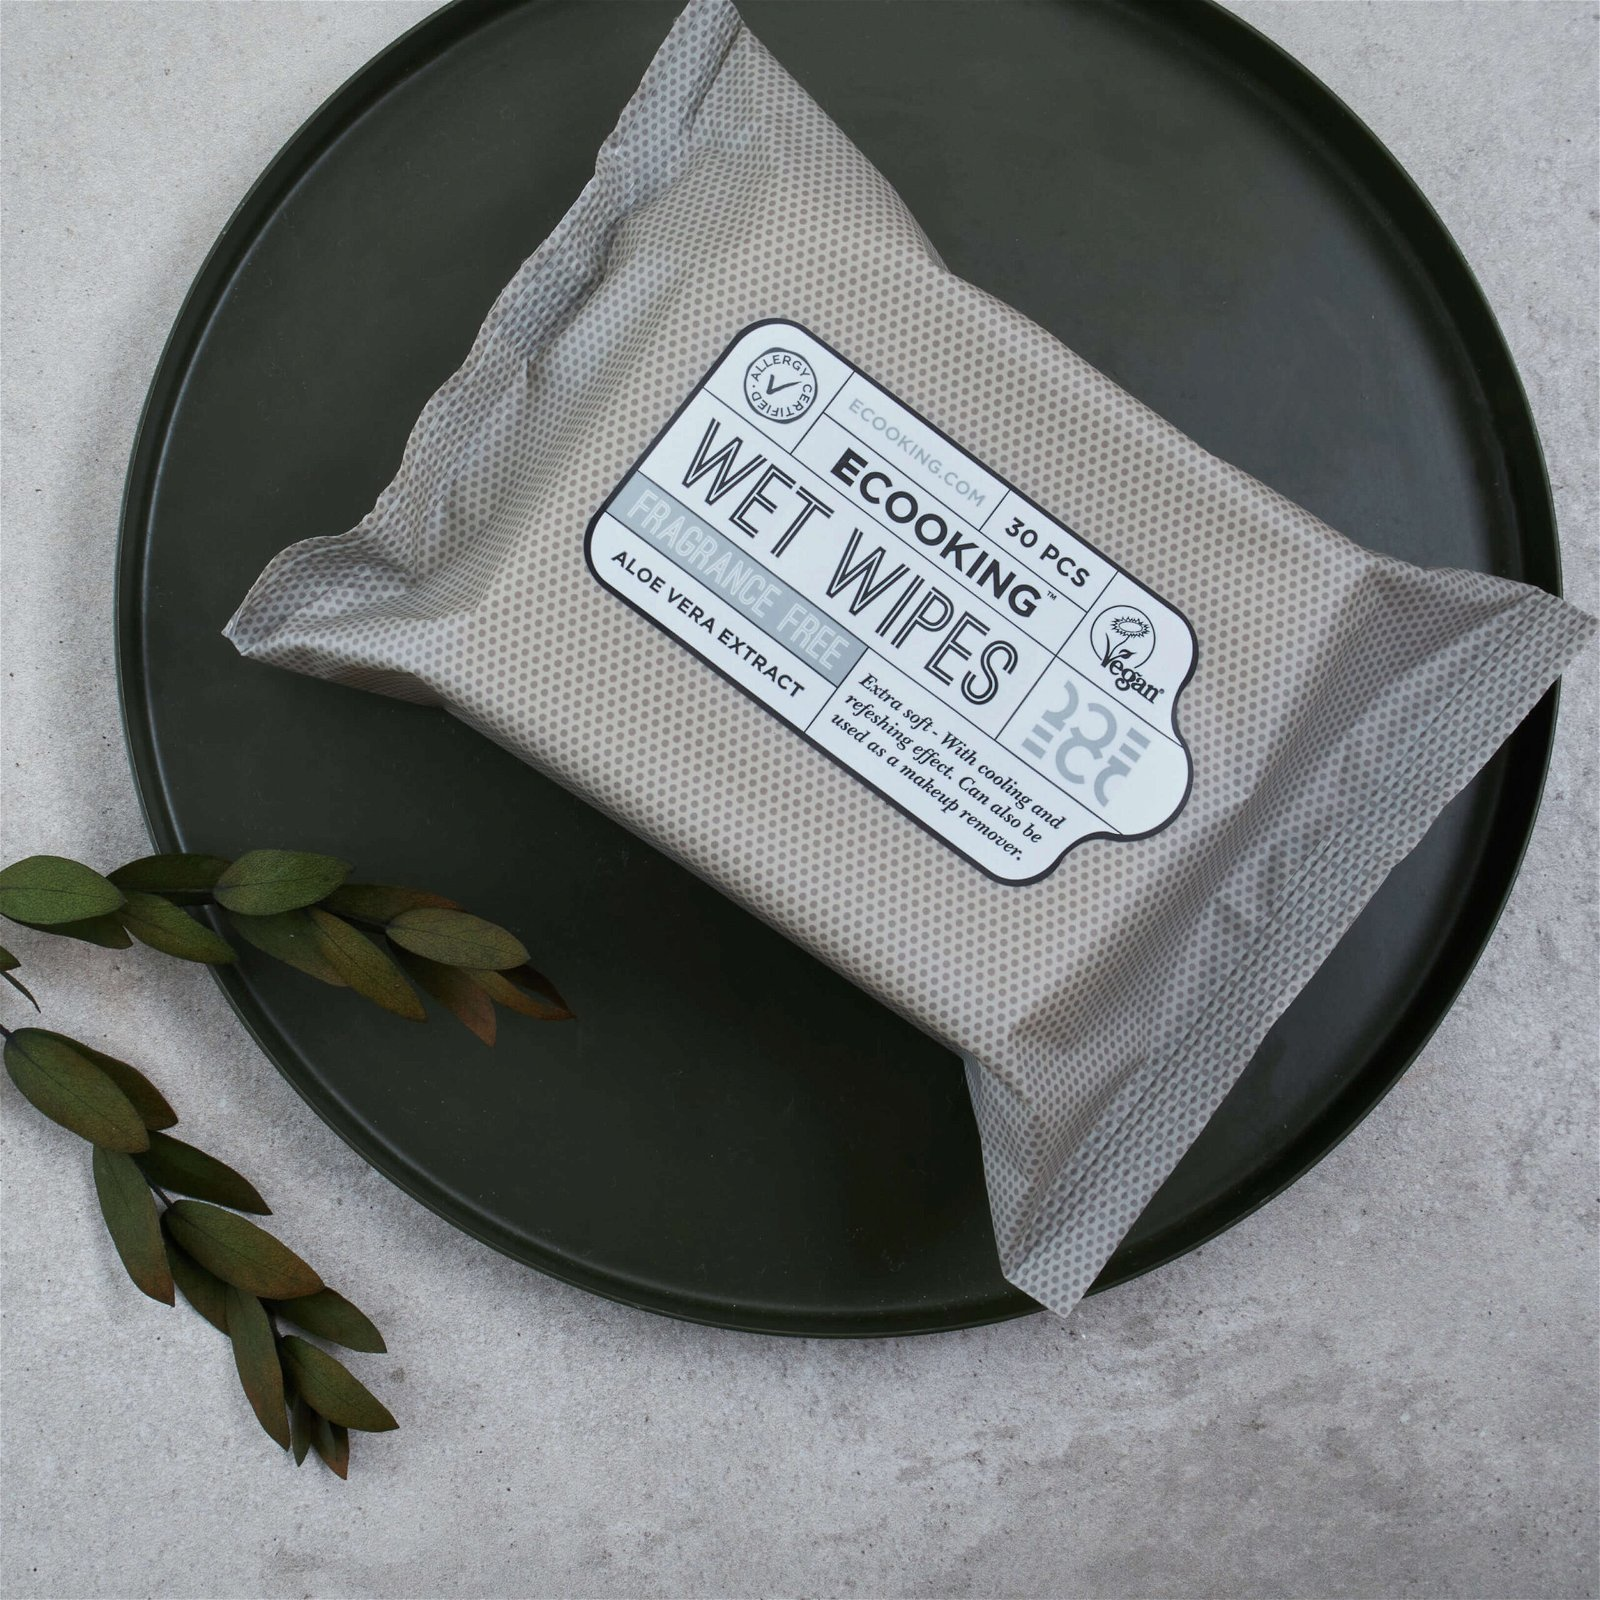 Wet Wipes 30 pcs Fragrance Free